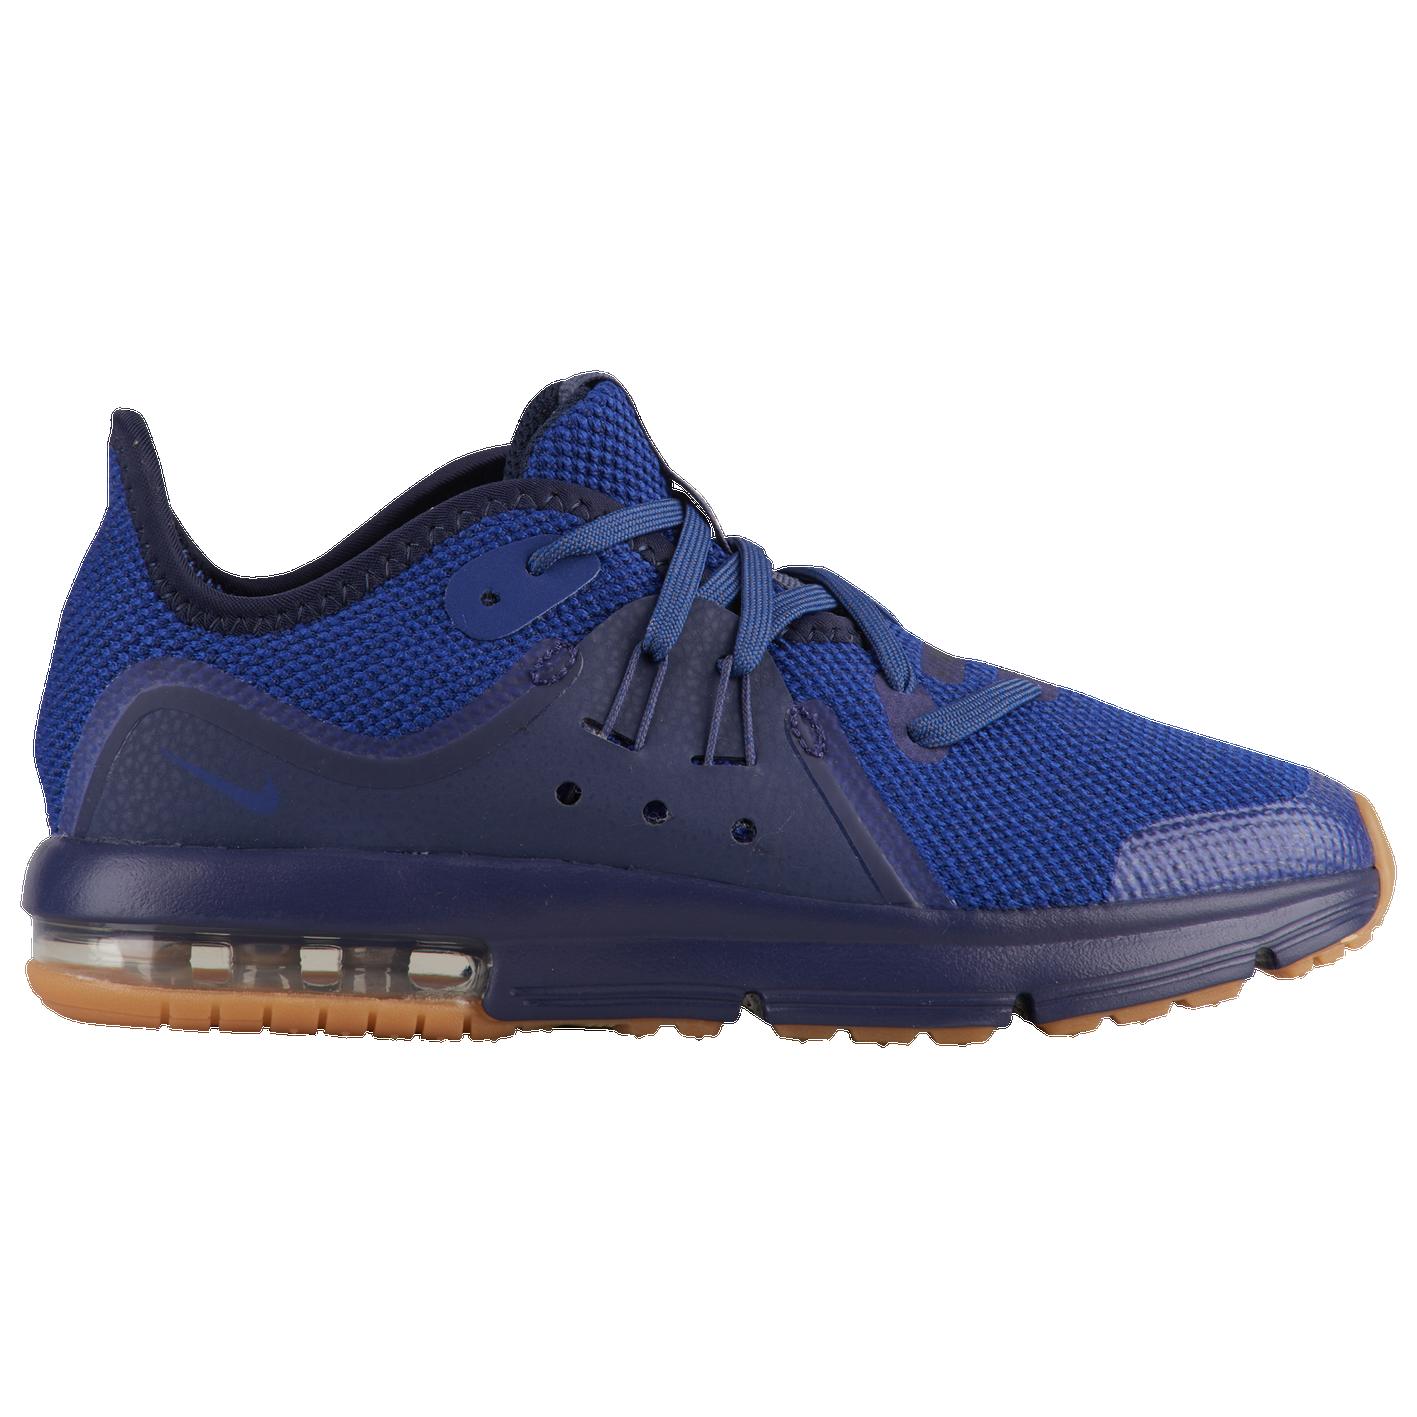 37c515a4ce Nike Air Max Sequent 3 - Boys' Preschool - Running - Shoes ...